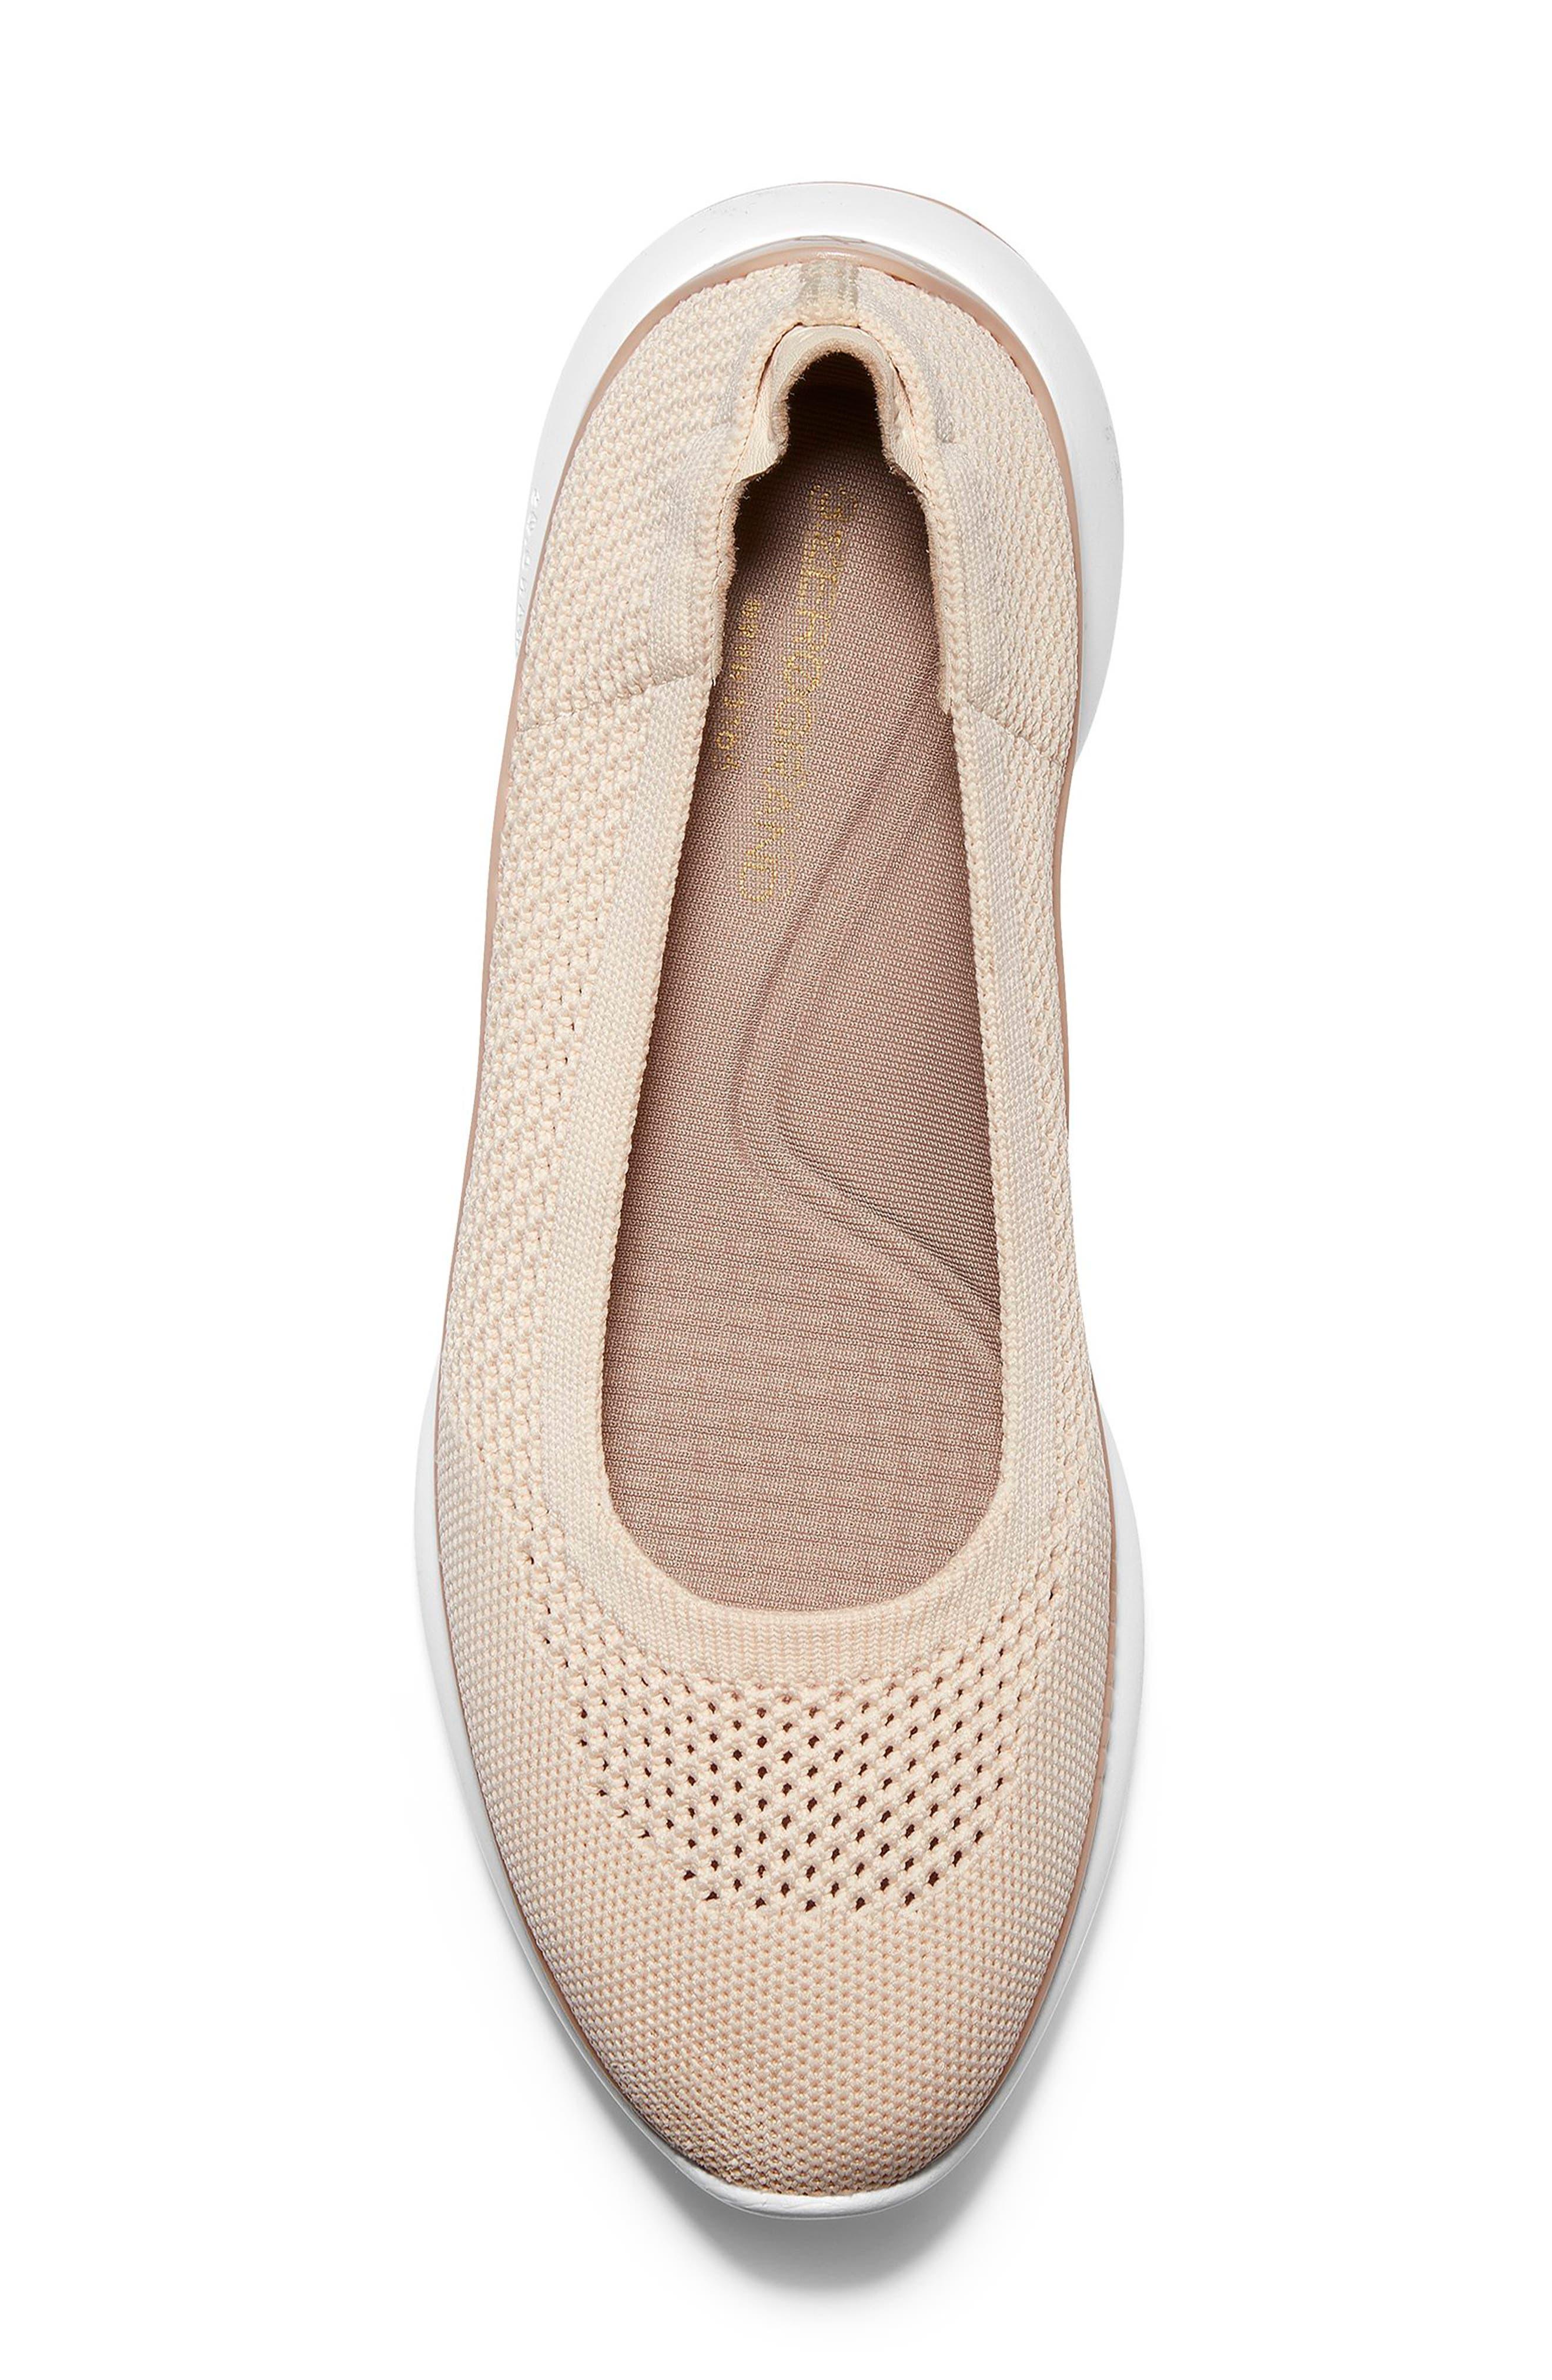 ZeroGrand Knit Sneaker,                             Alternate thumbnail 5, color,                             SAND/ ROSE KNIT/ LEATHER